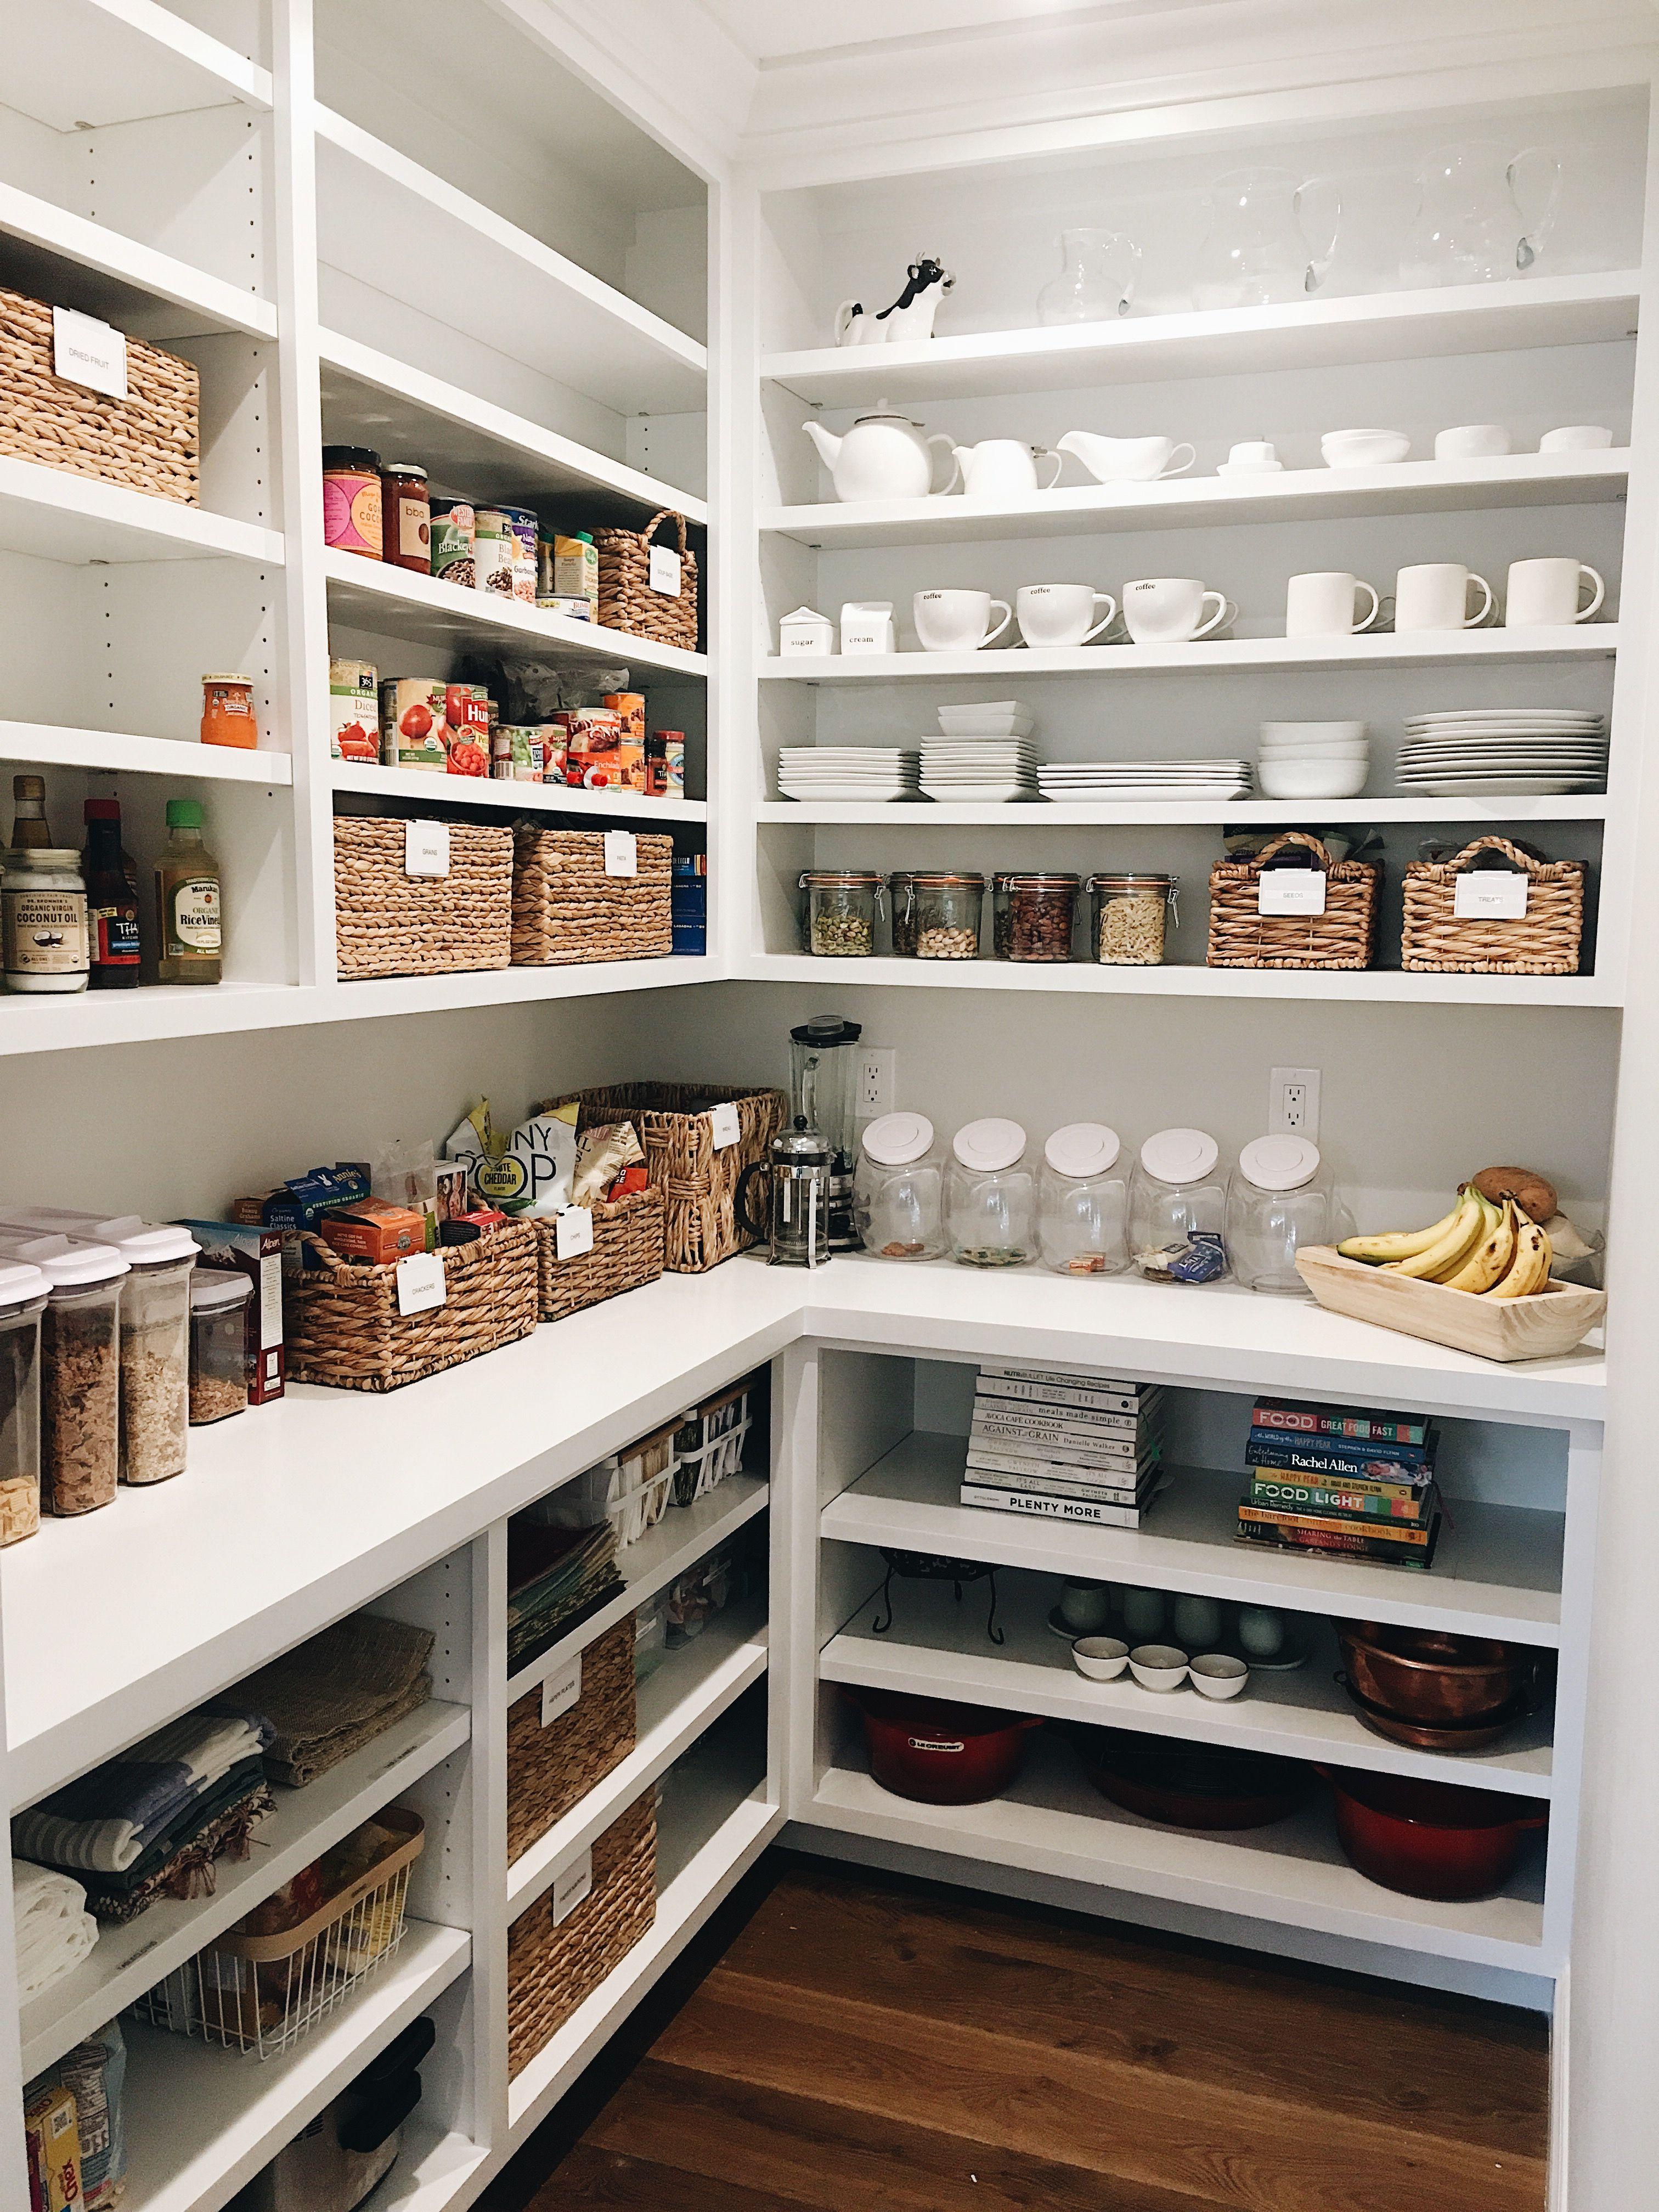 Pantry goals food pantry in 2019 Kitchen organization